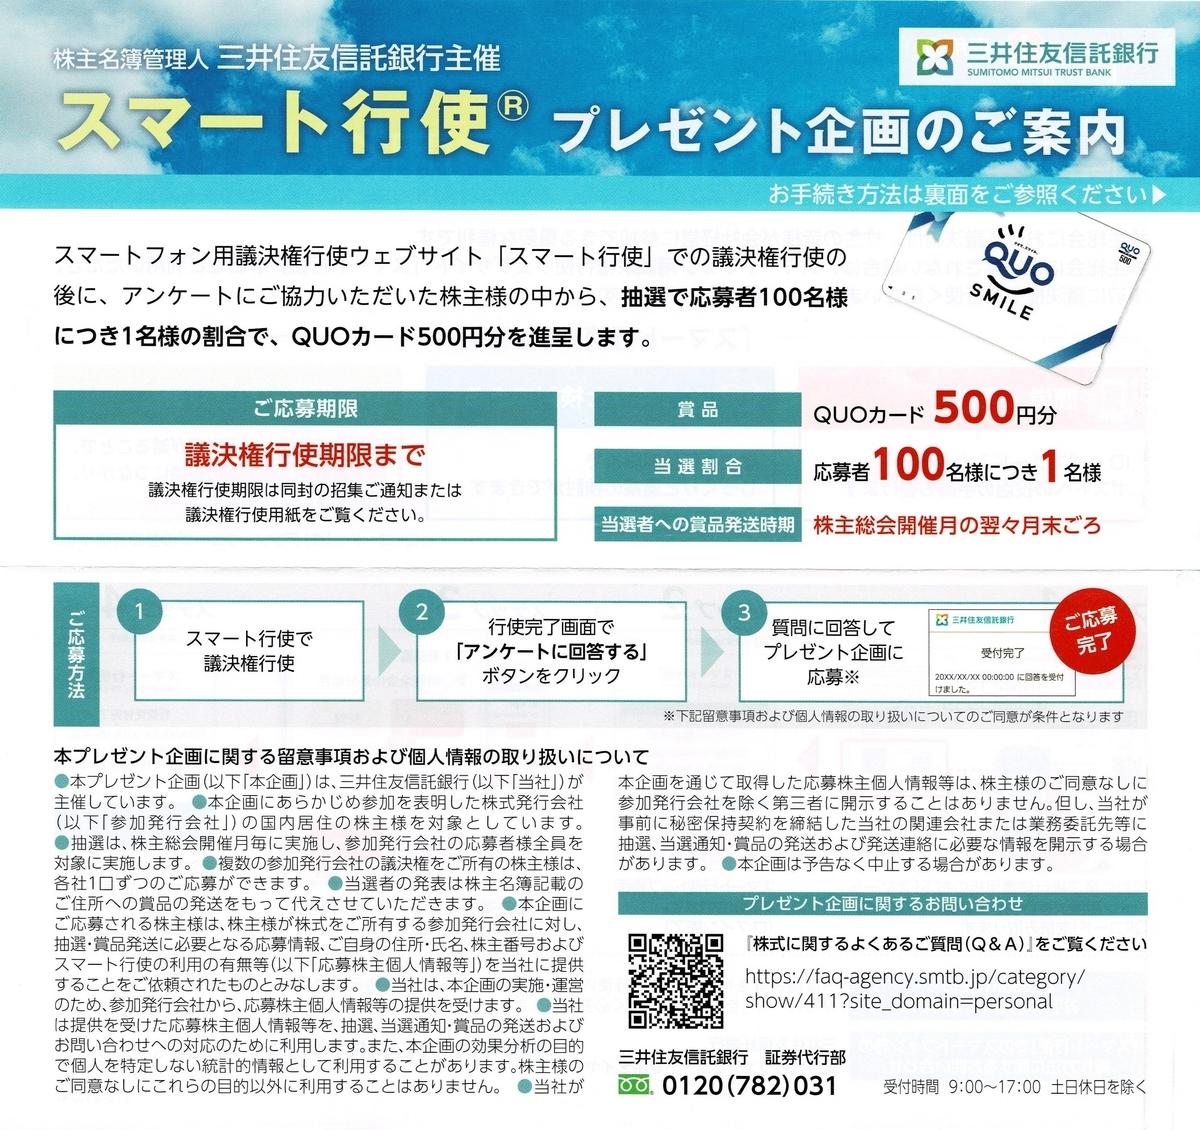 f:id:hanayamatoro:20210615091227j:plain